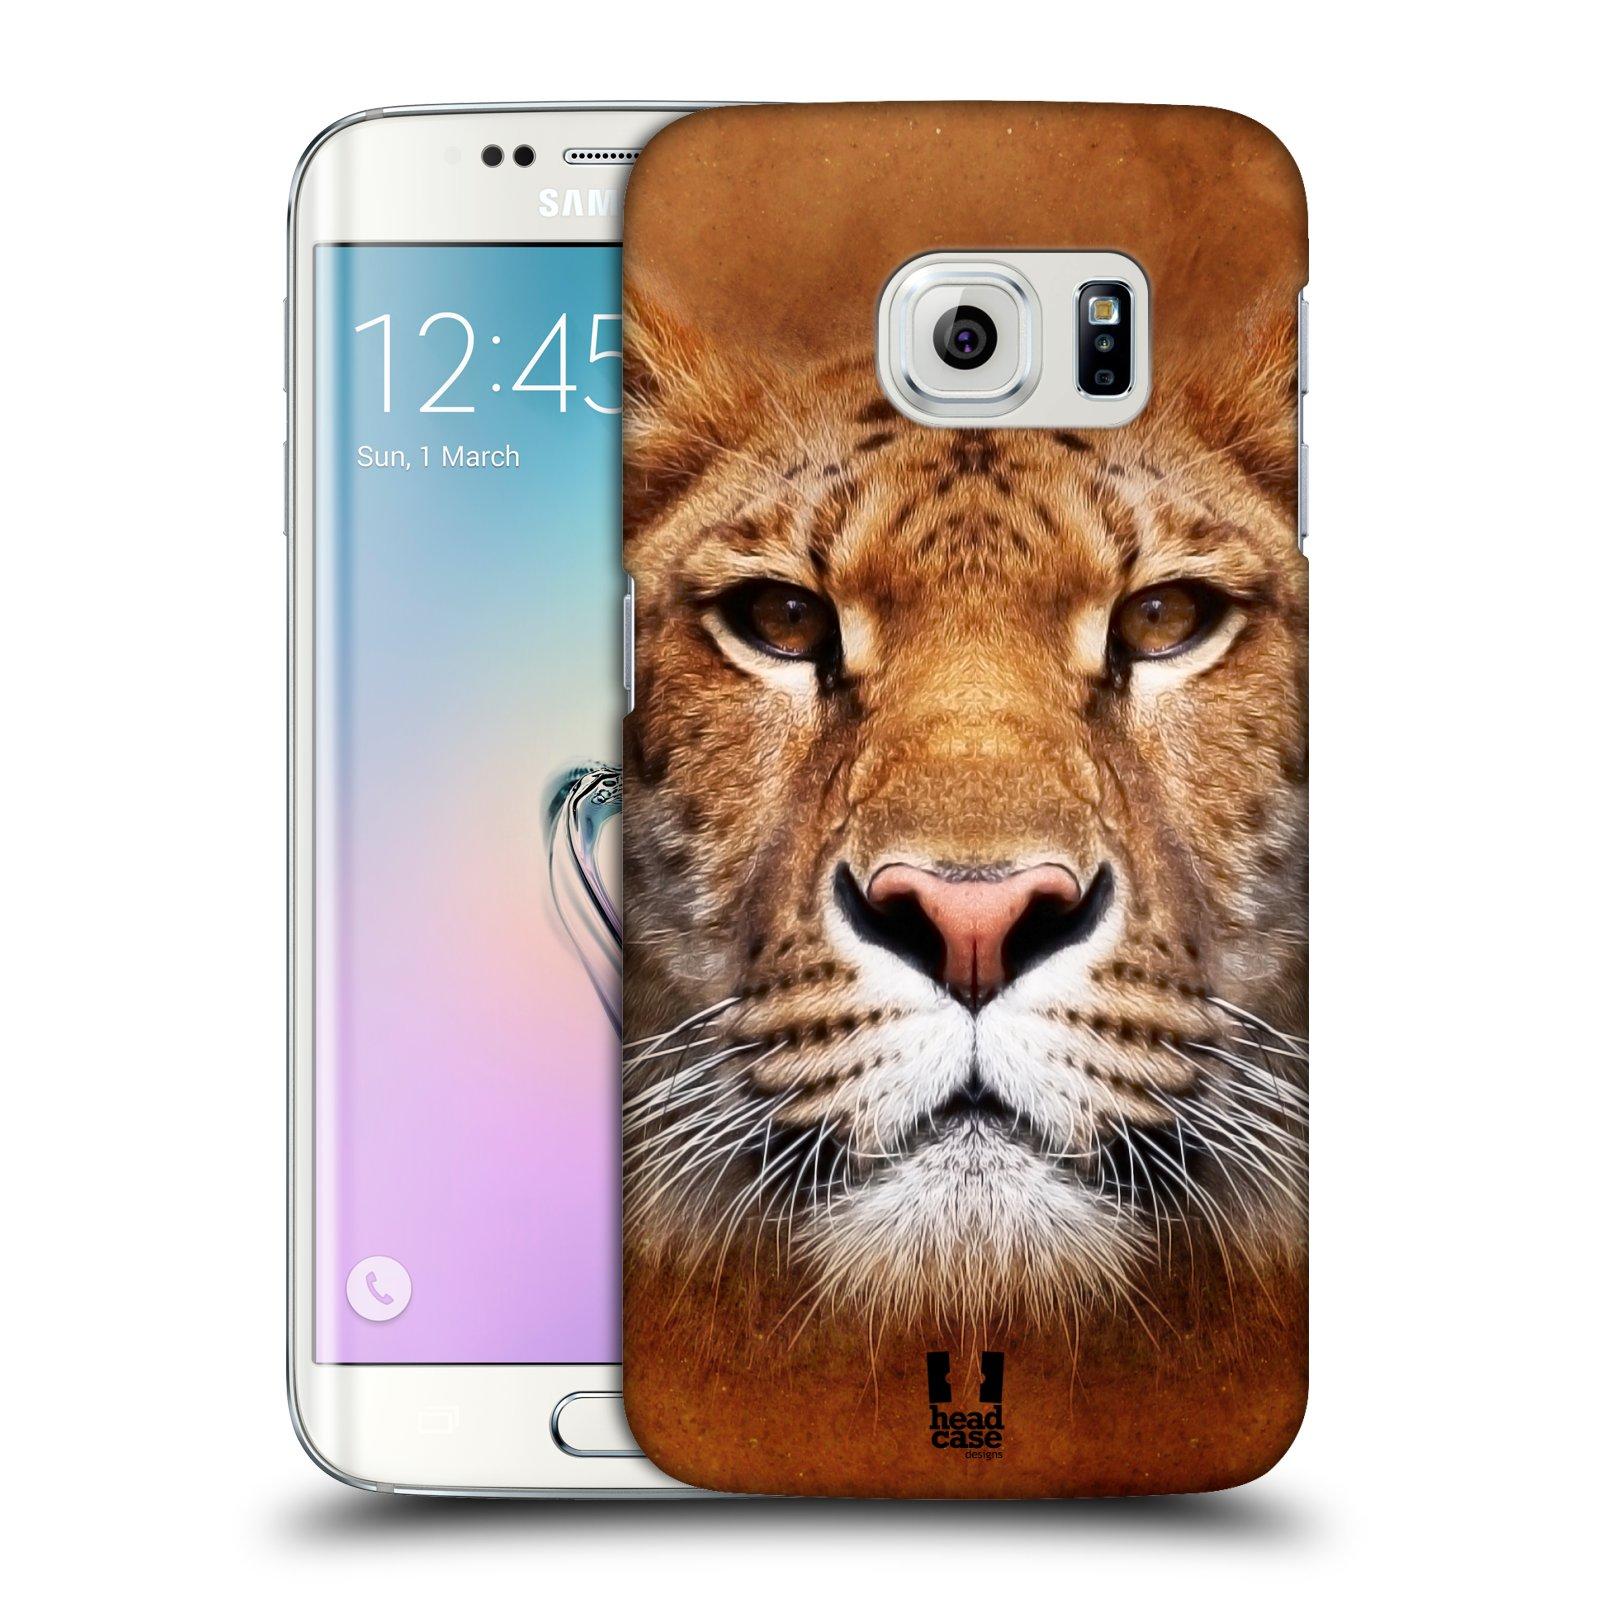 HEAD CASE plastový obal na mobil SAMSUNG Galaxy S6 EDGE (G9250, G925, G925F) vzor Zvířecí tváře Sibiřský tygr